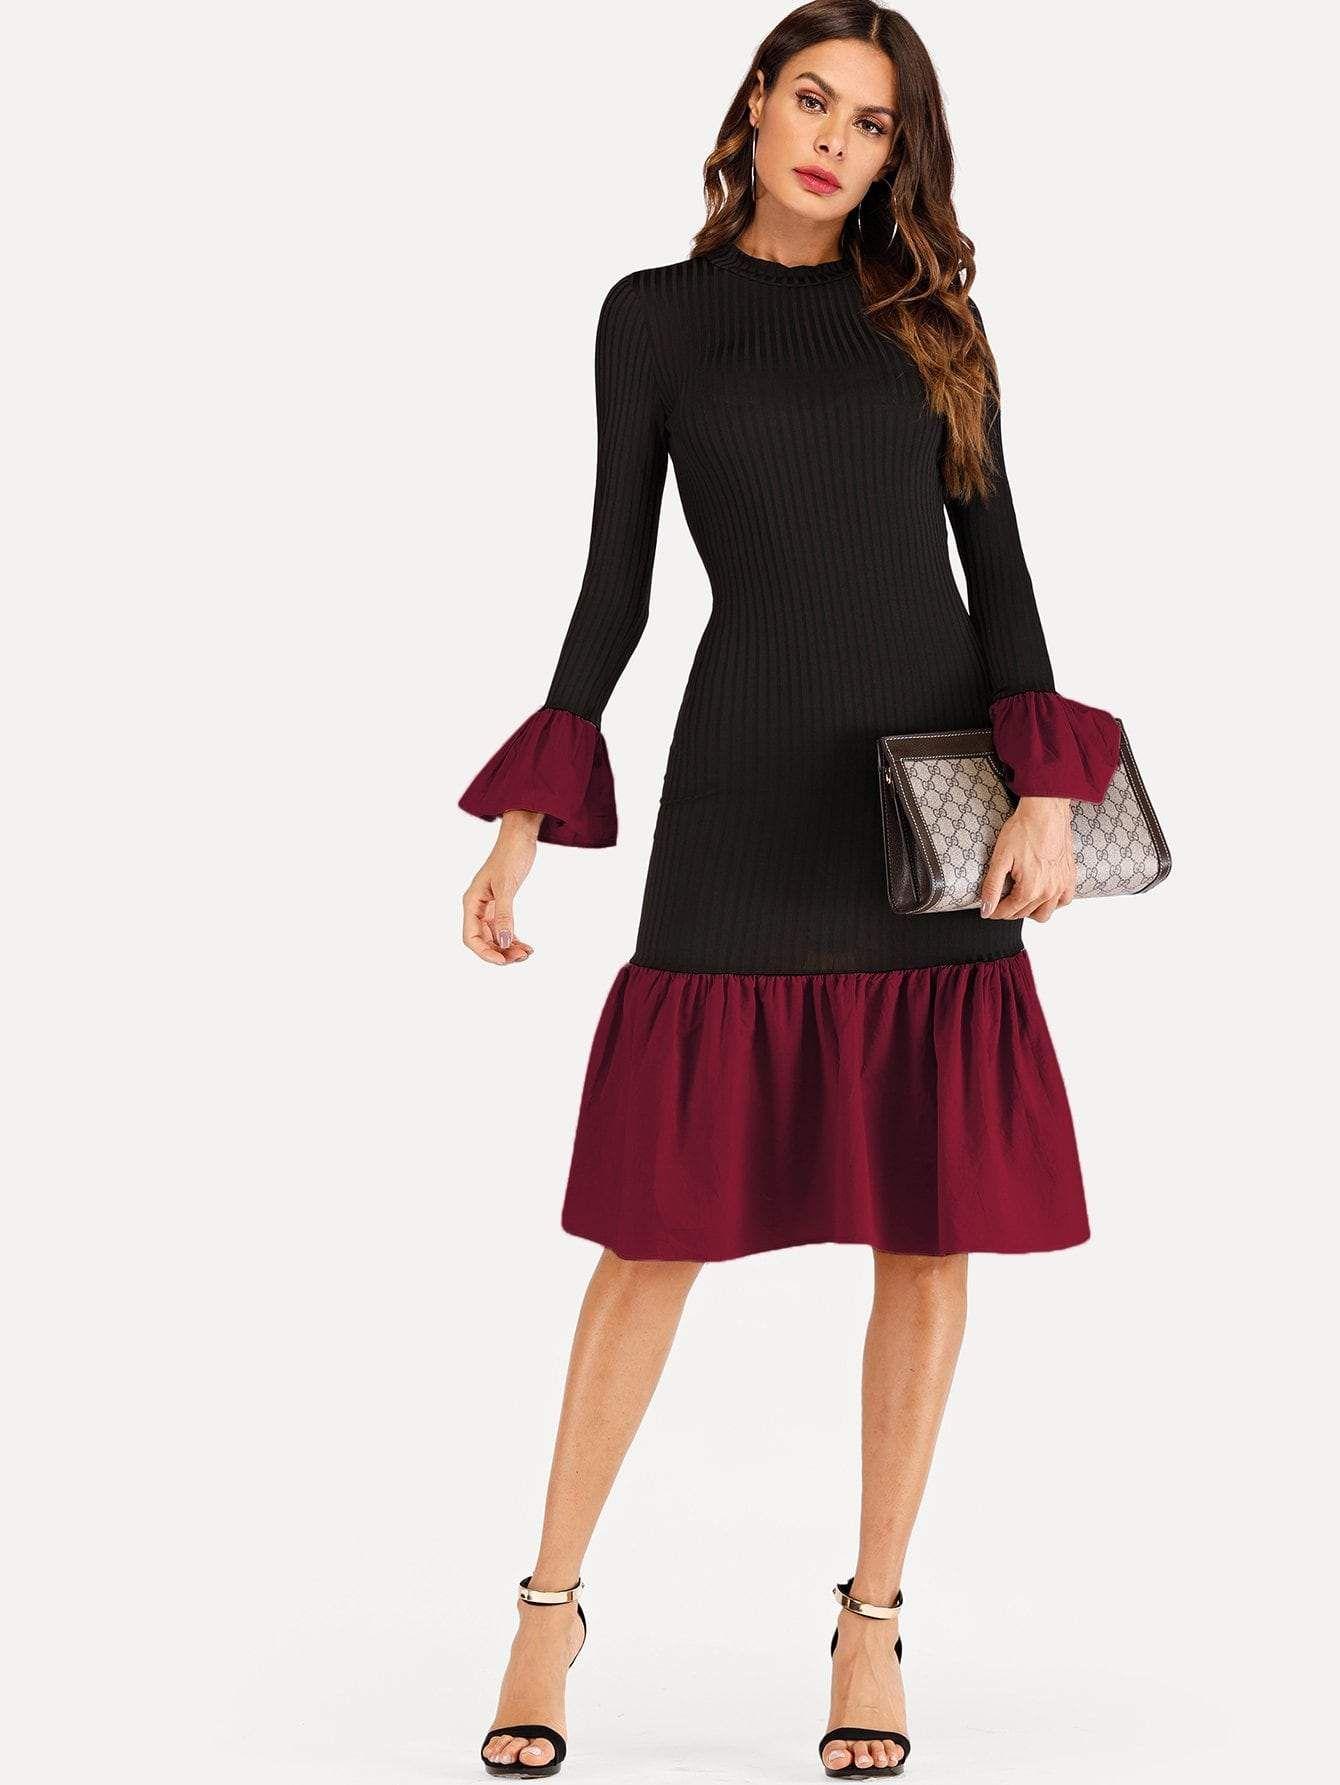 5305bf32d8b contrast ruffle hem knit dress.  dresses  clothing  style  outfits fashion